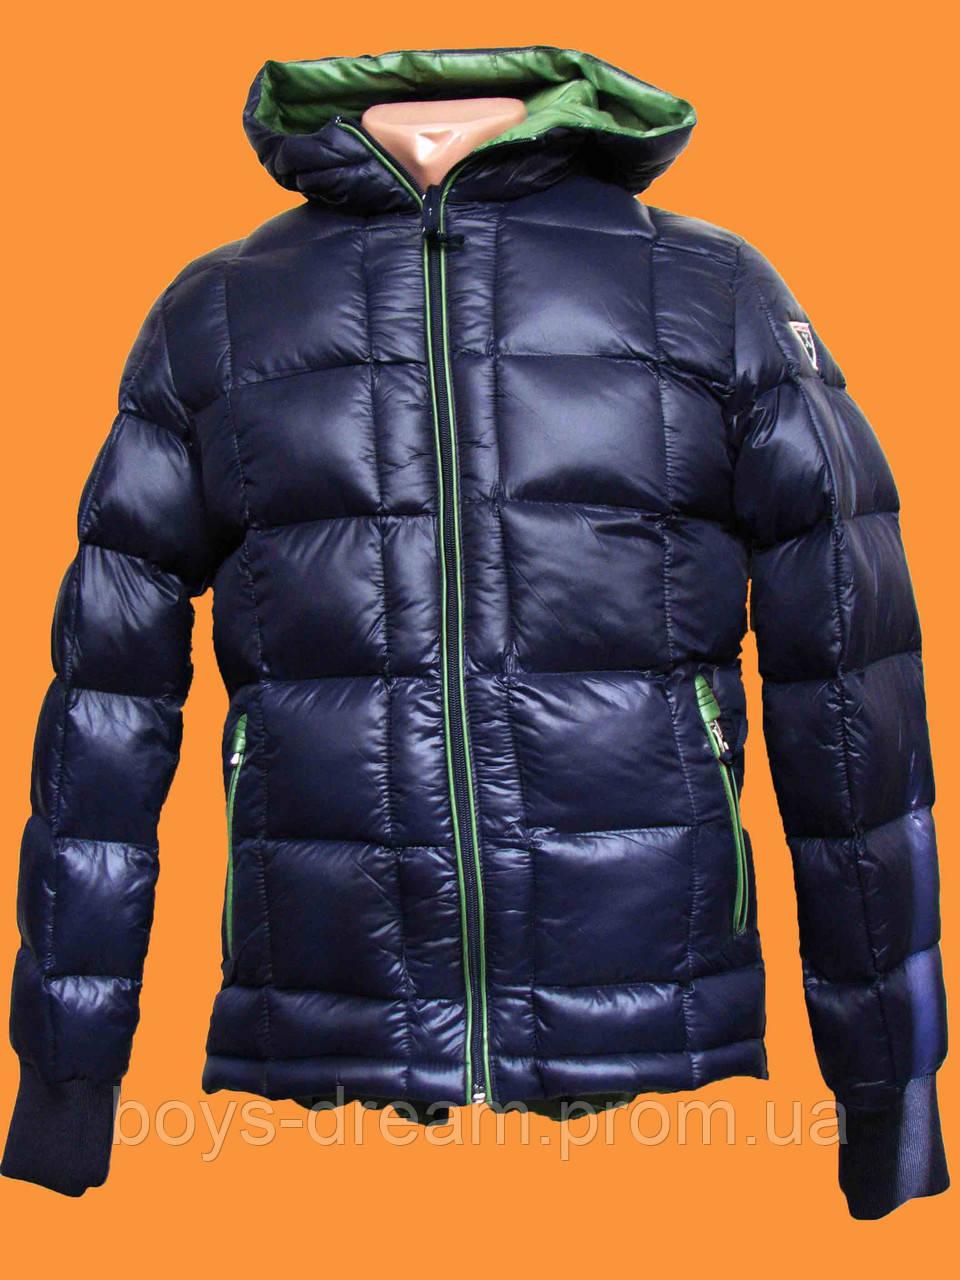 Куртка демисезонная Encore 158 (Турция)f